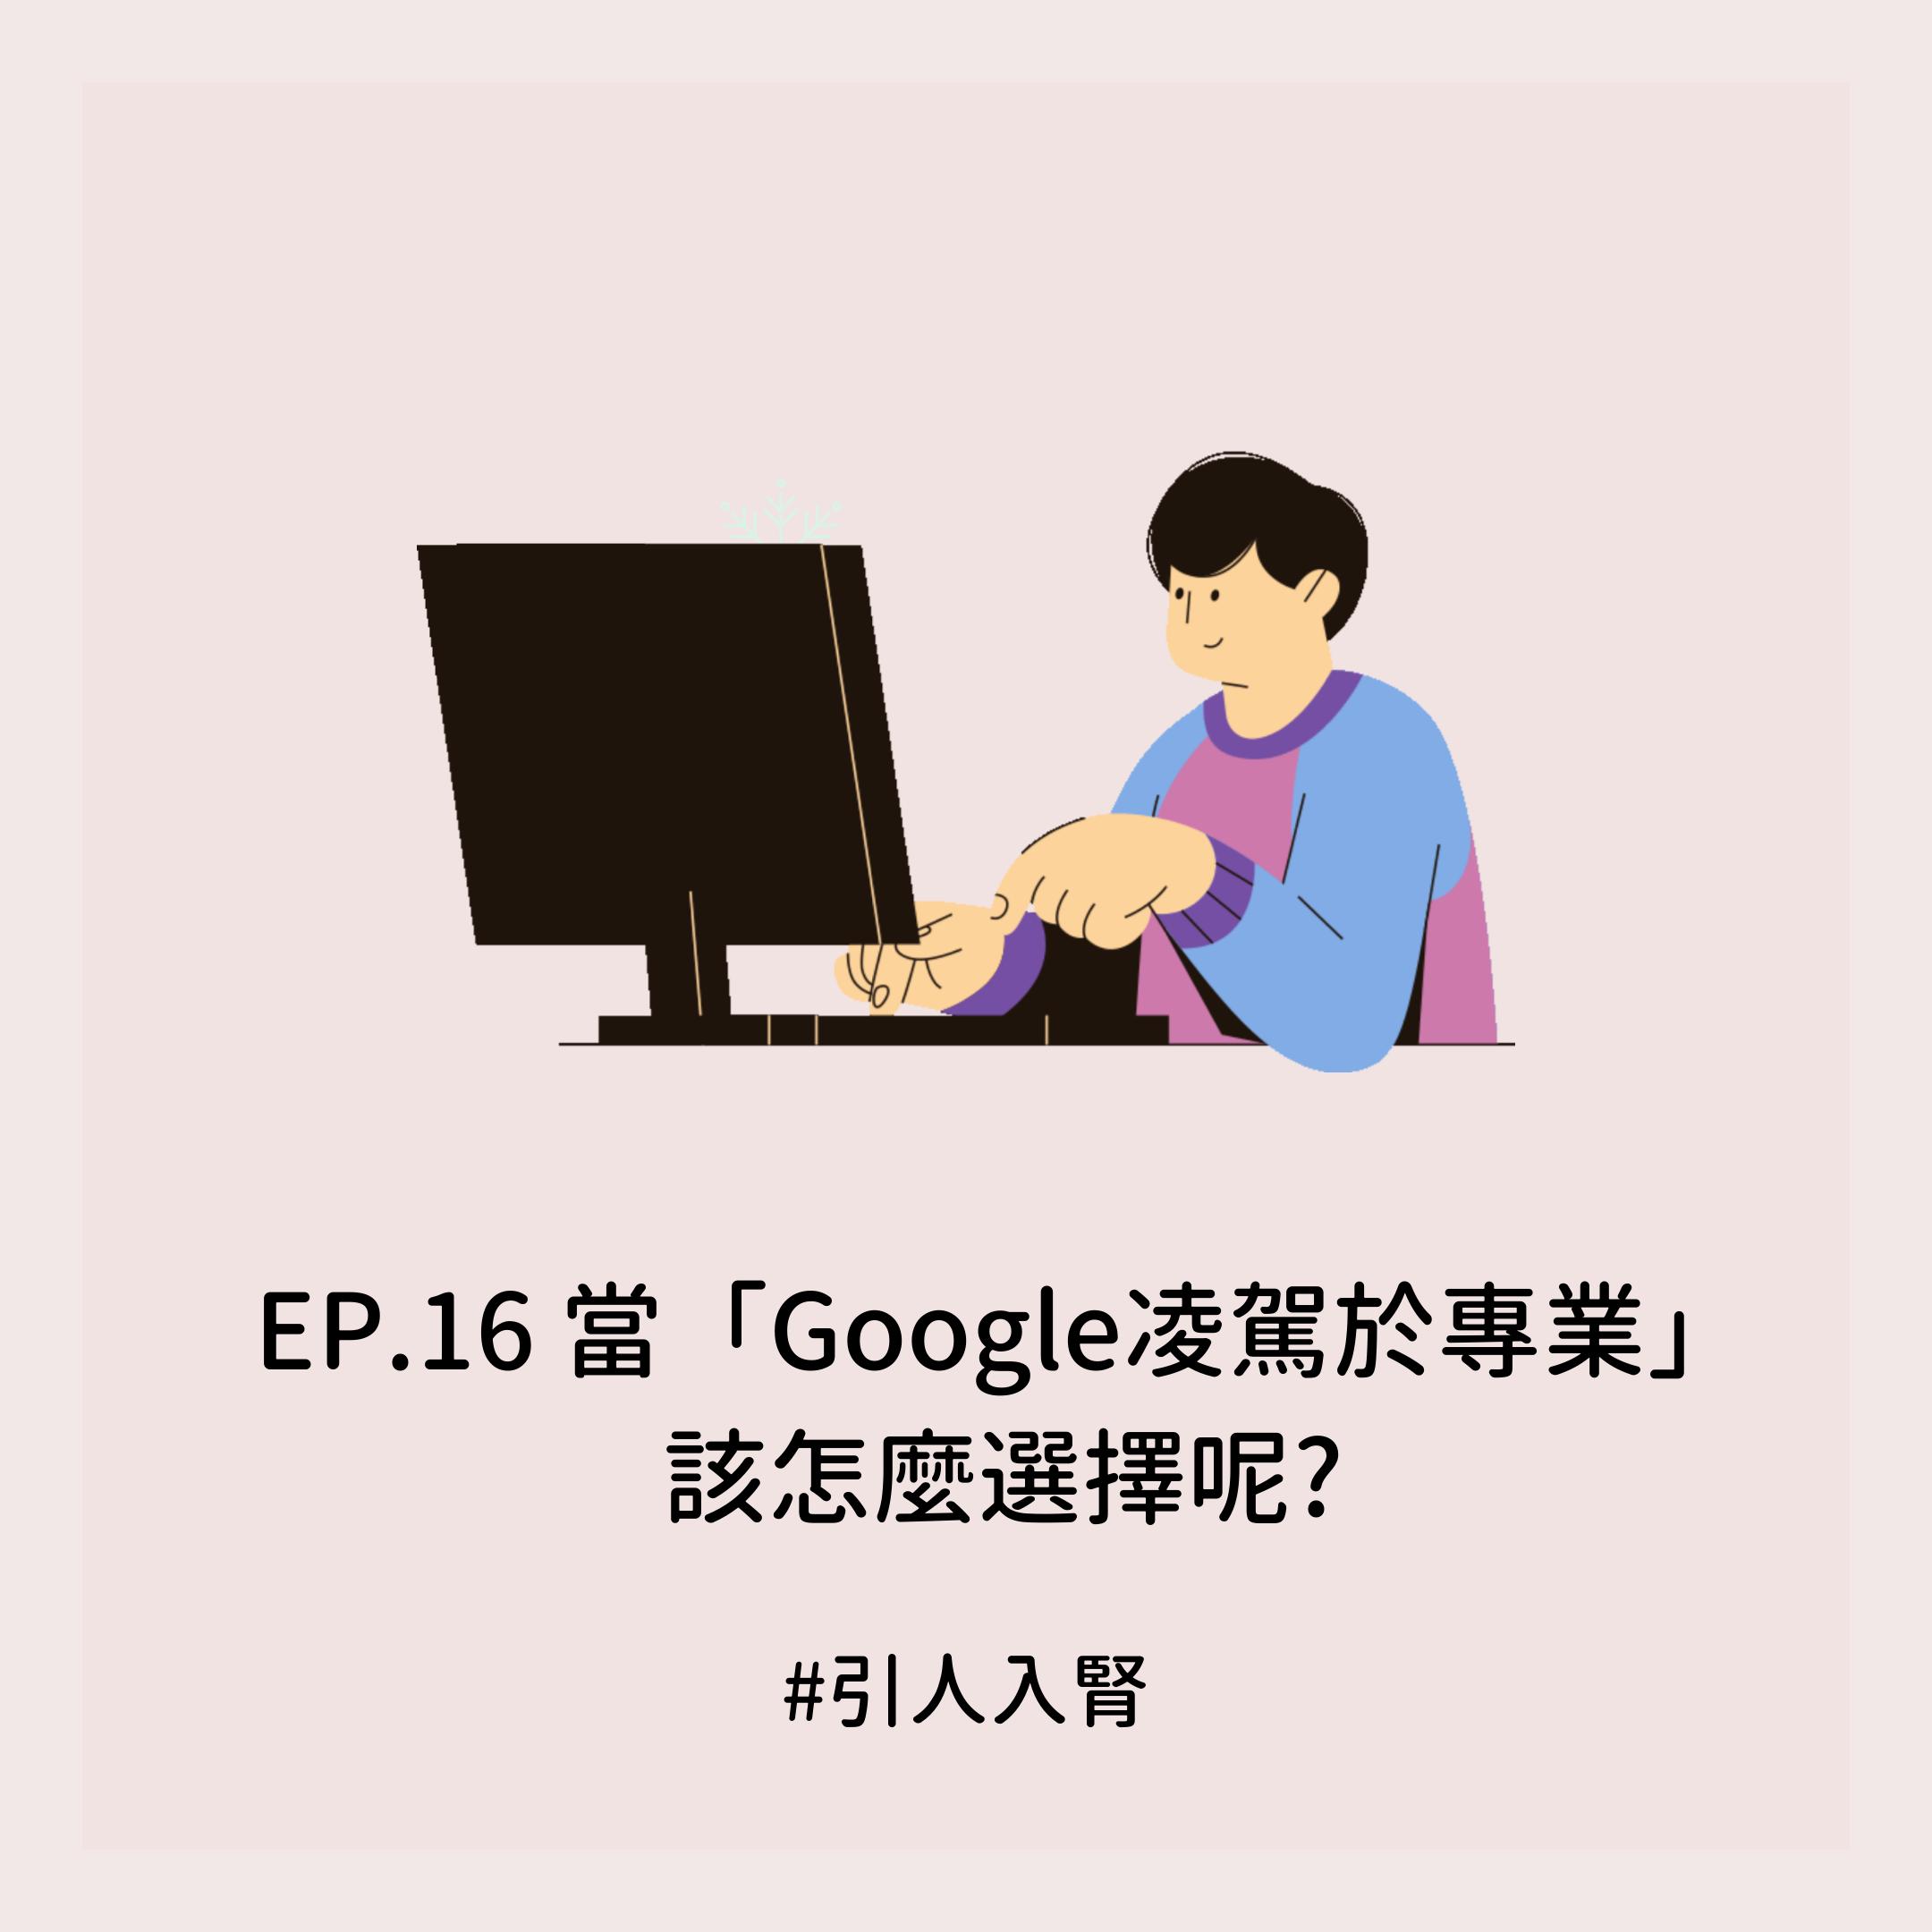 EP.16【時事】當「Google凌駕於專業」,該怎麼選擇呢?